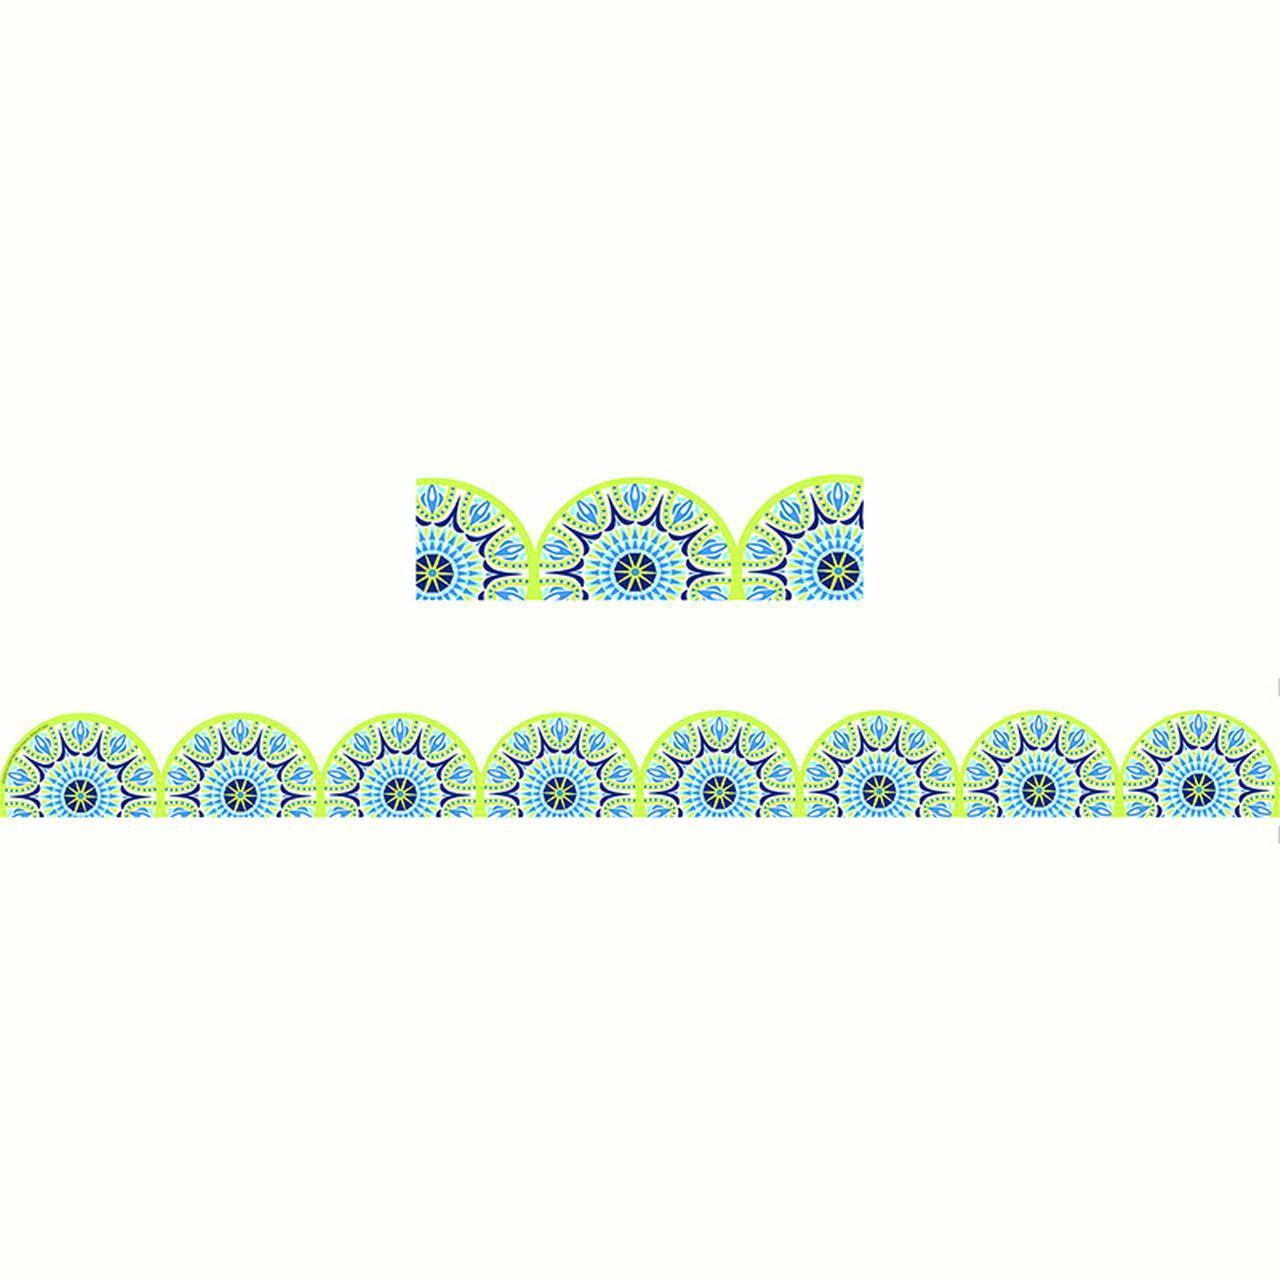 EU 840382 BLUE HARMONY DECO KIT